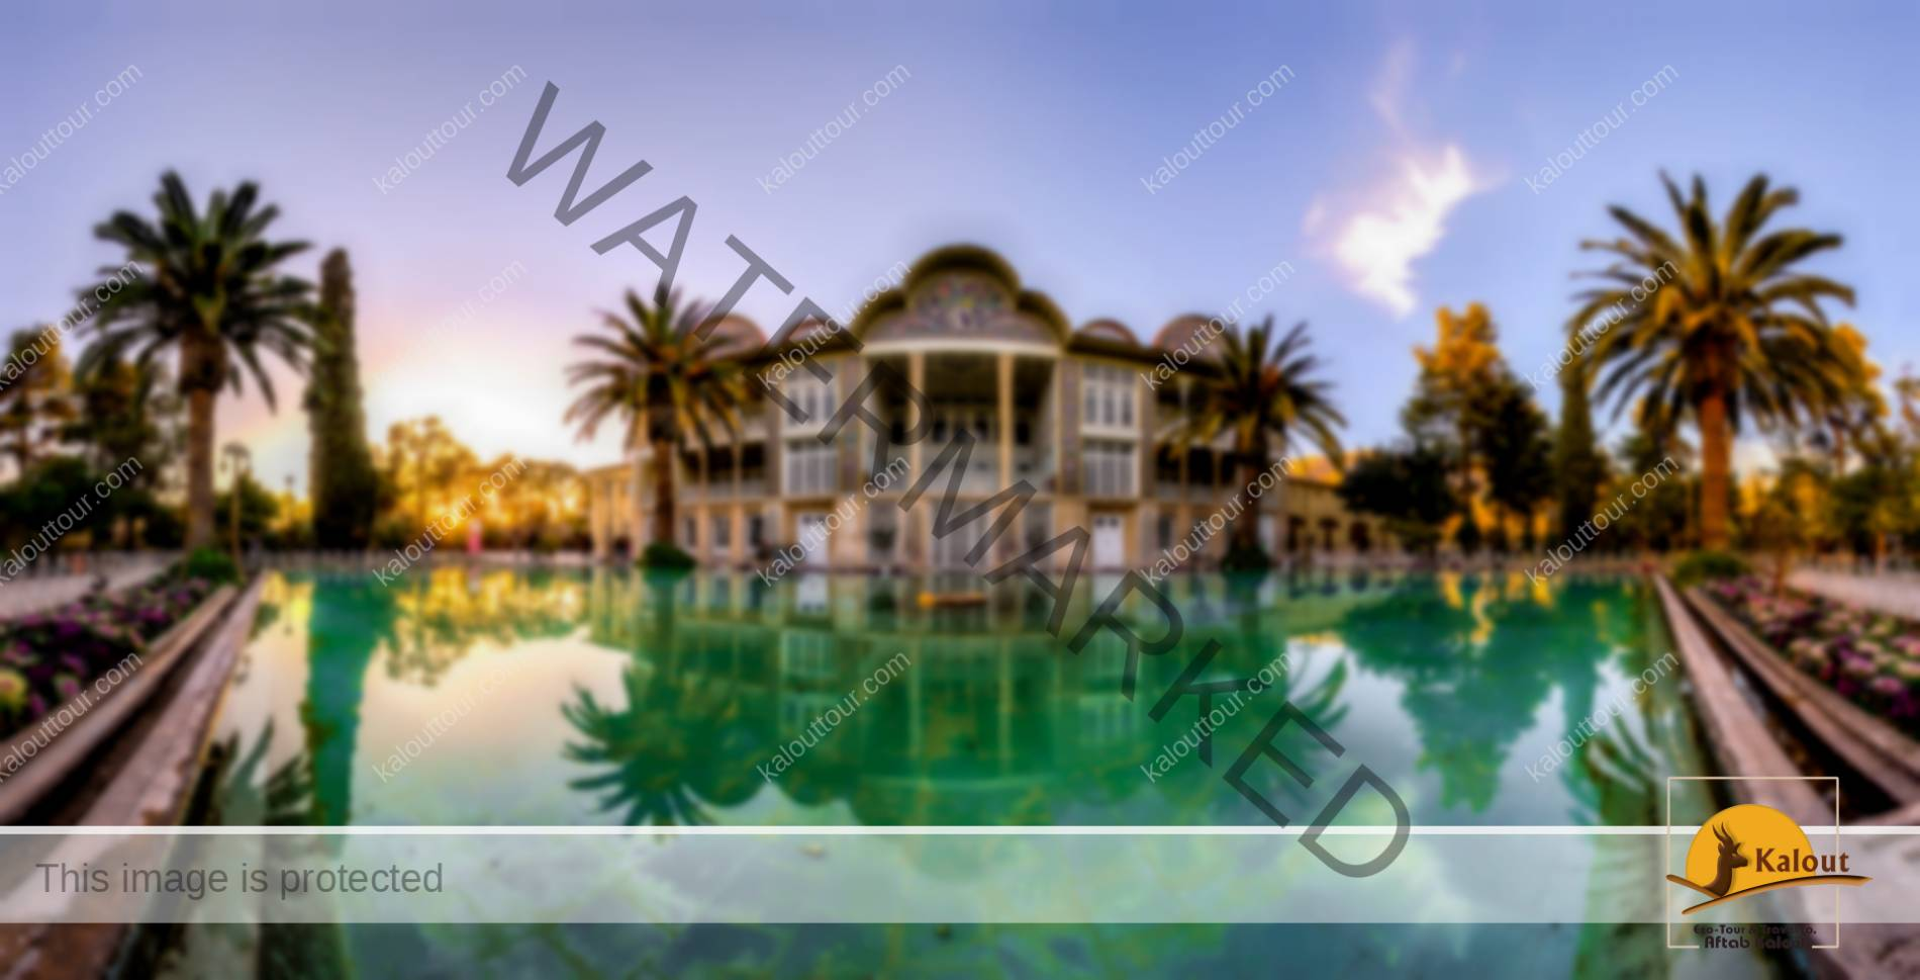 Eram-Garden-Shiraz-HD Iran World Heritage Sites Uncategorized Iran World Heritage Sites Iran Culture